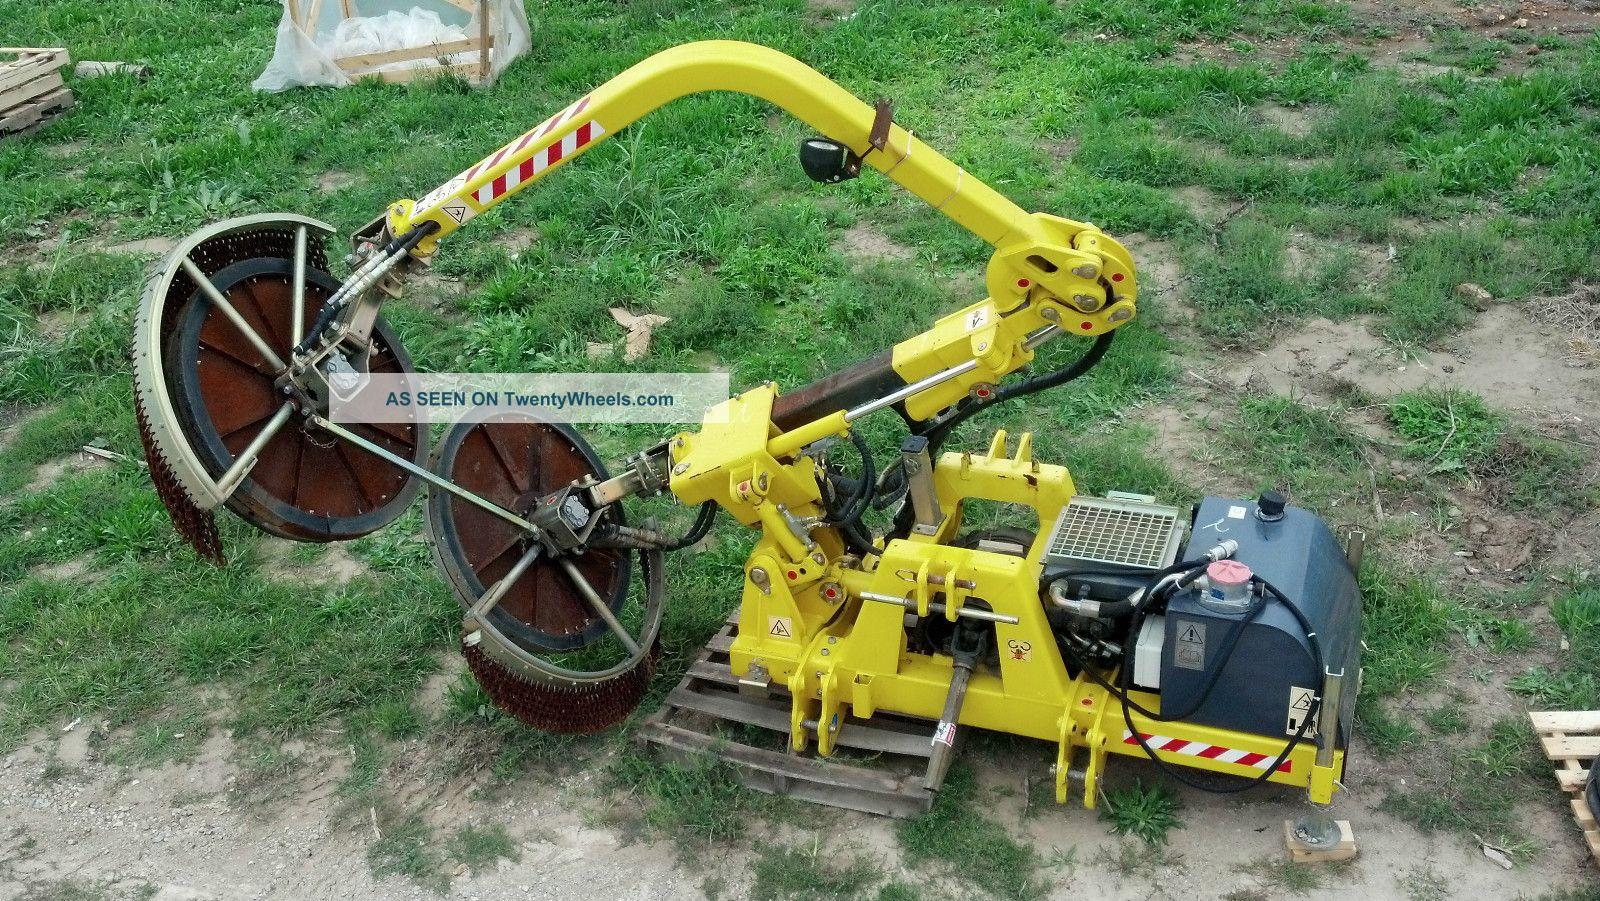 Guardrail Fenceline Mower Boom Reach Brush Hog Flail Cutter Attachment Arm Trim Tractors photo